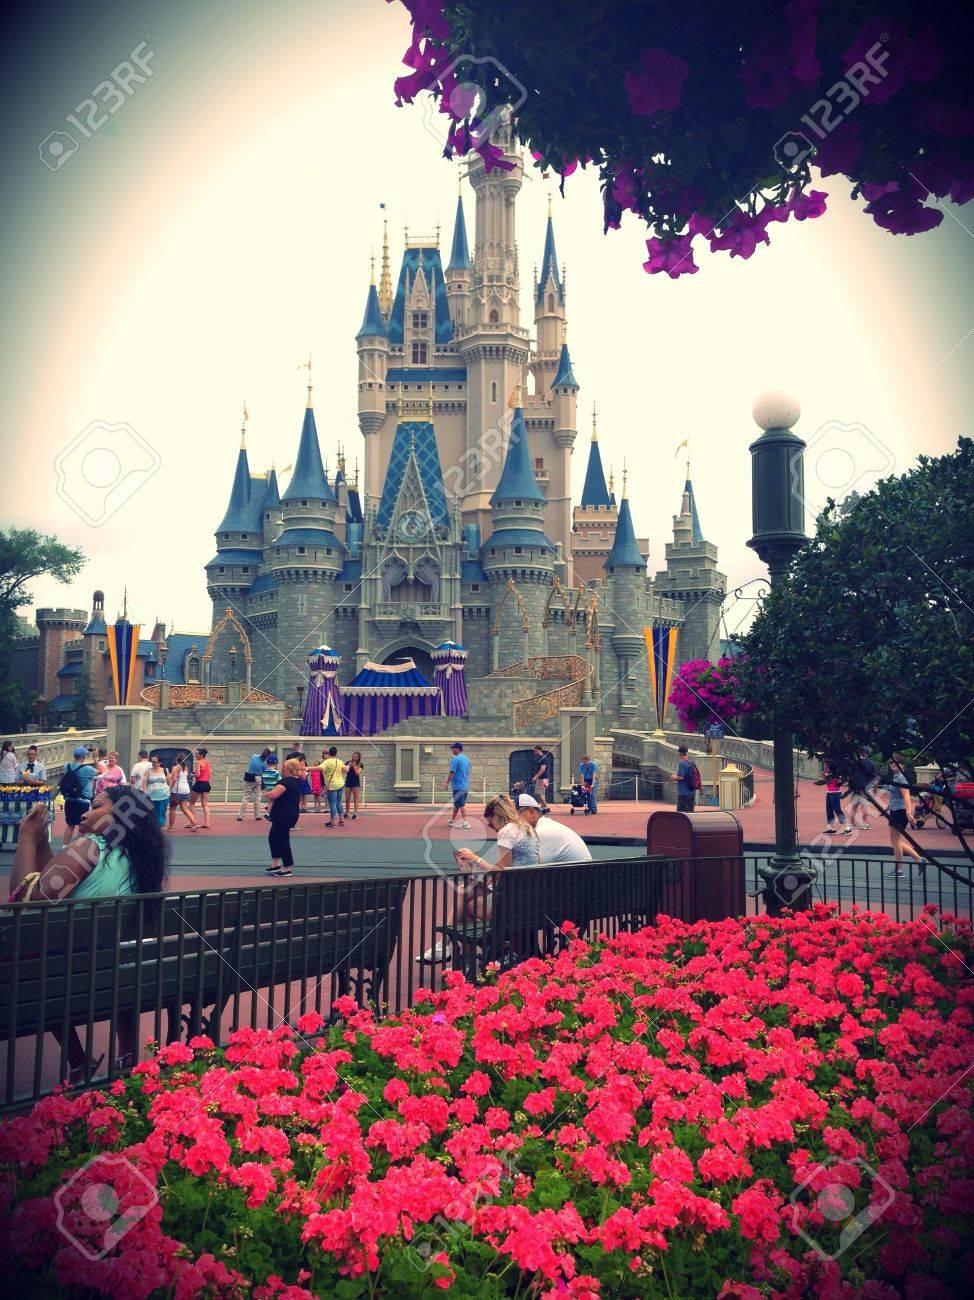 cinderella castle at the magic kingdom in walt disney world stock